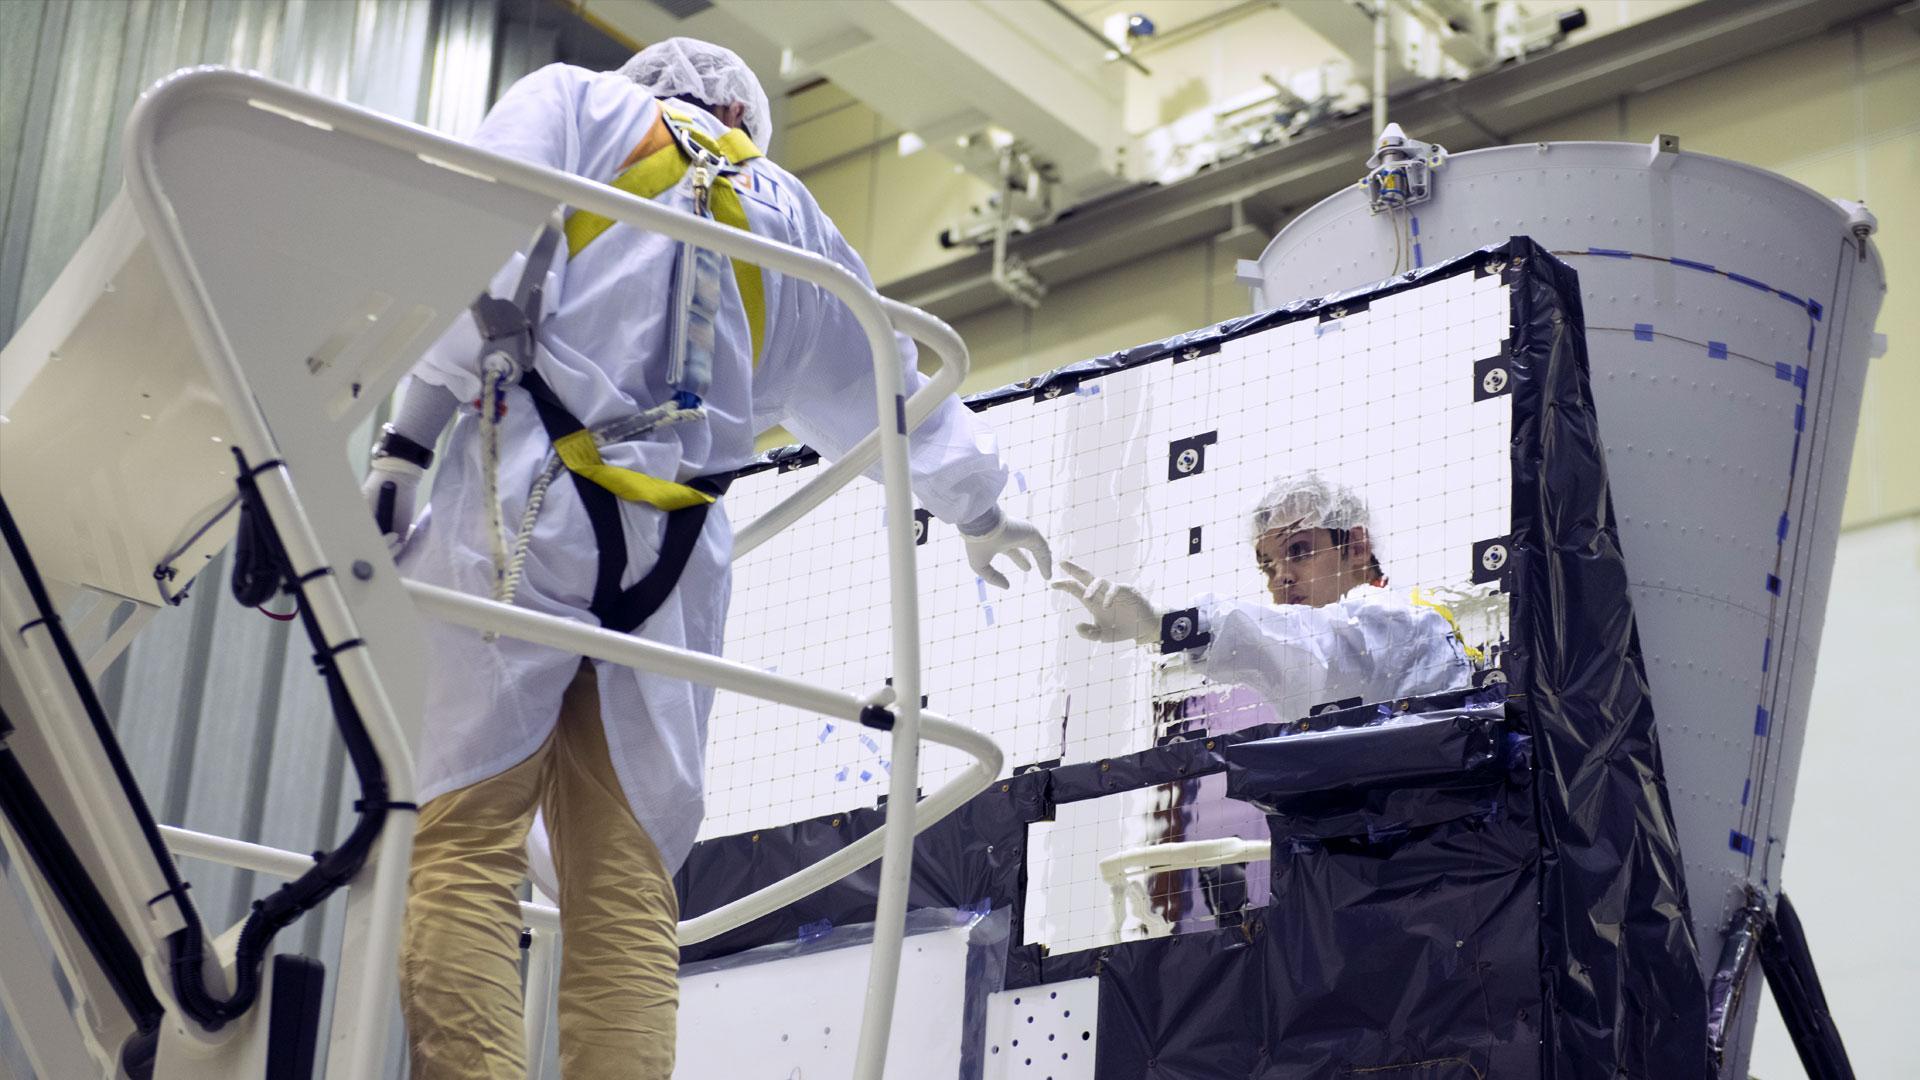 MTG Satellite in the Cleanroom